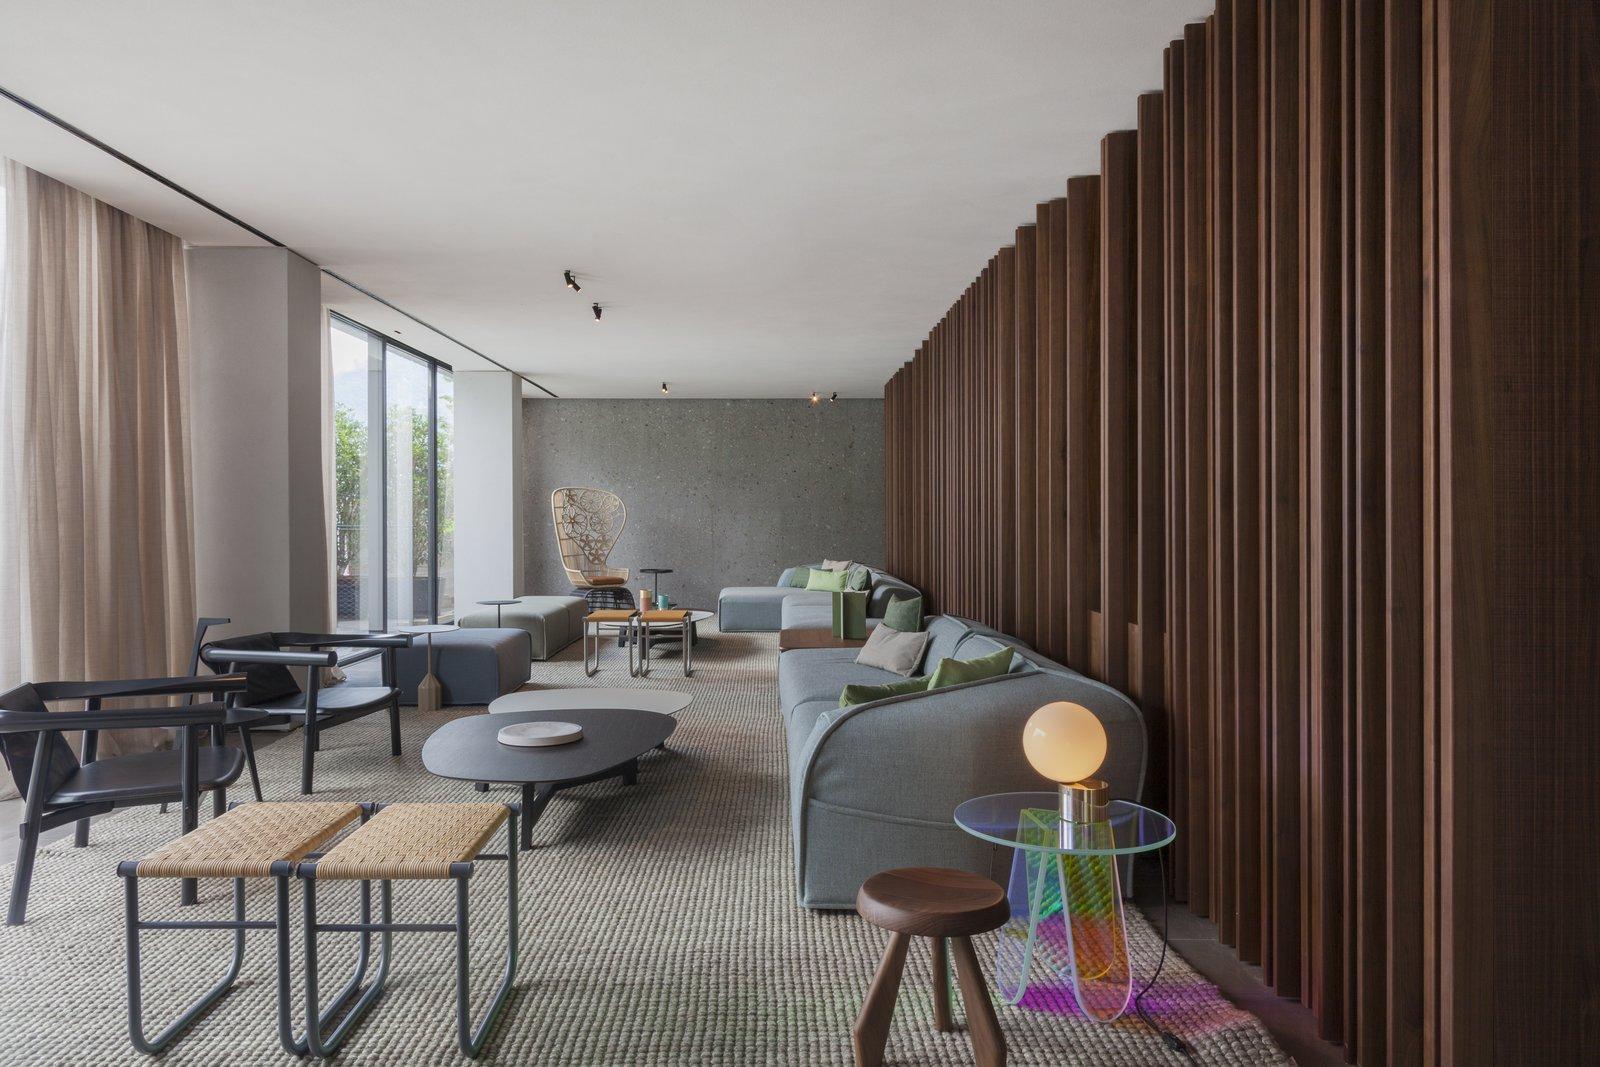 Photo 2 of 12 in A Modern Lake Como Retreat Designed by Patricia Urquiola